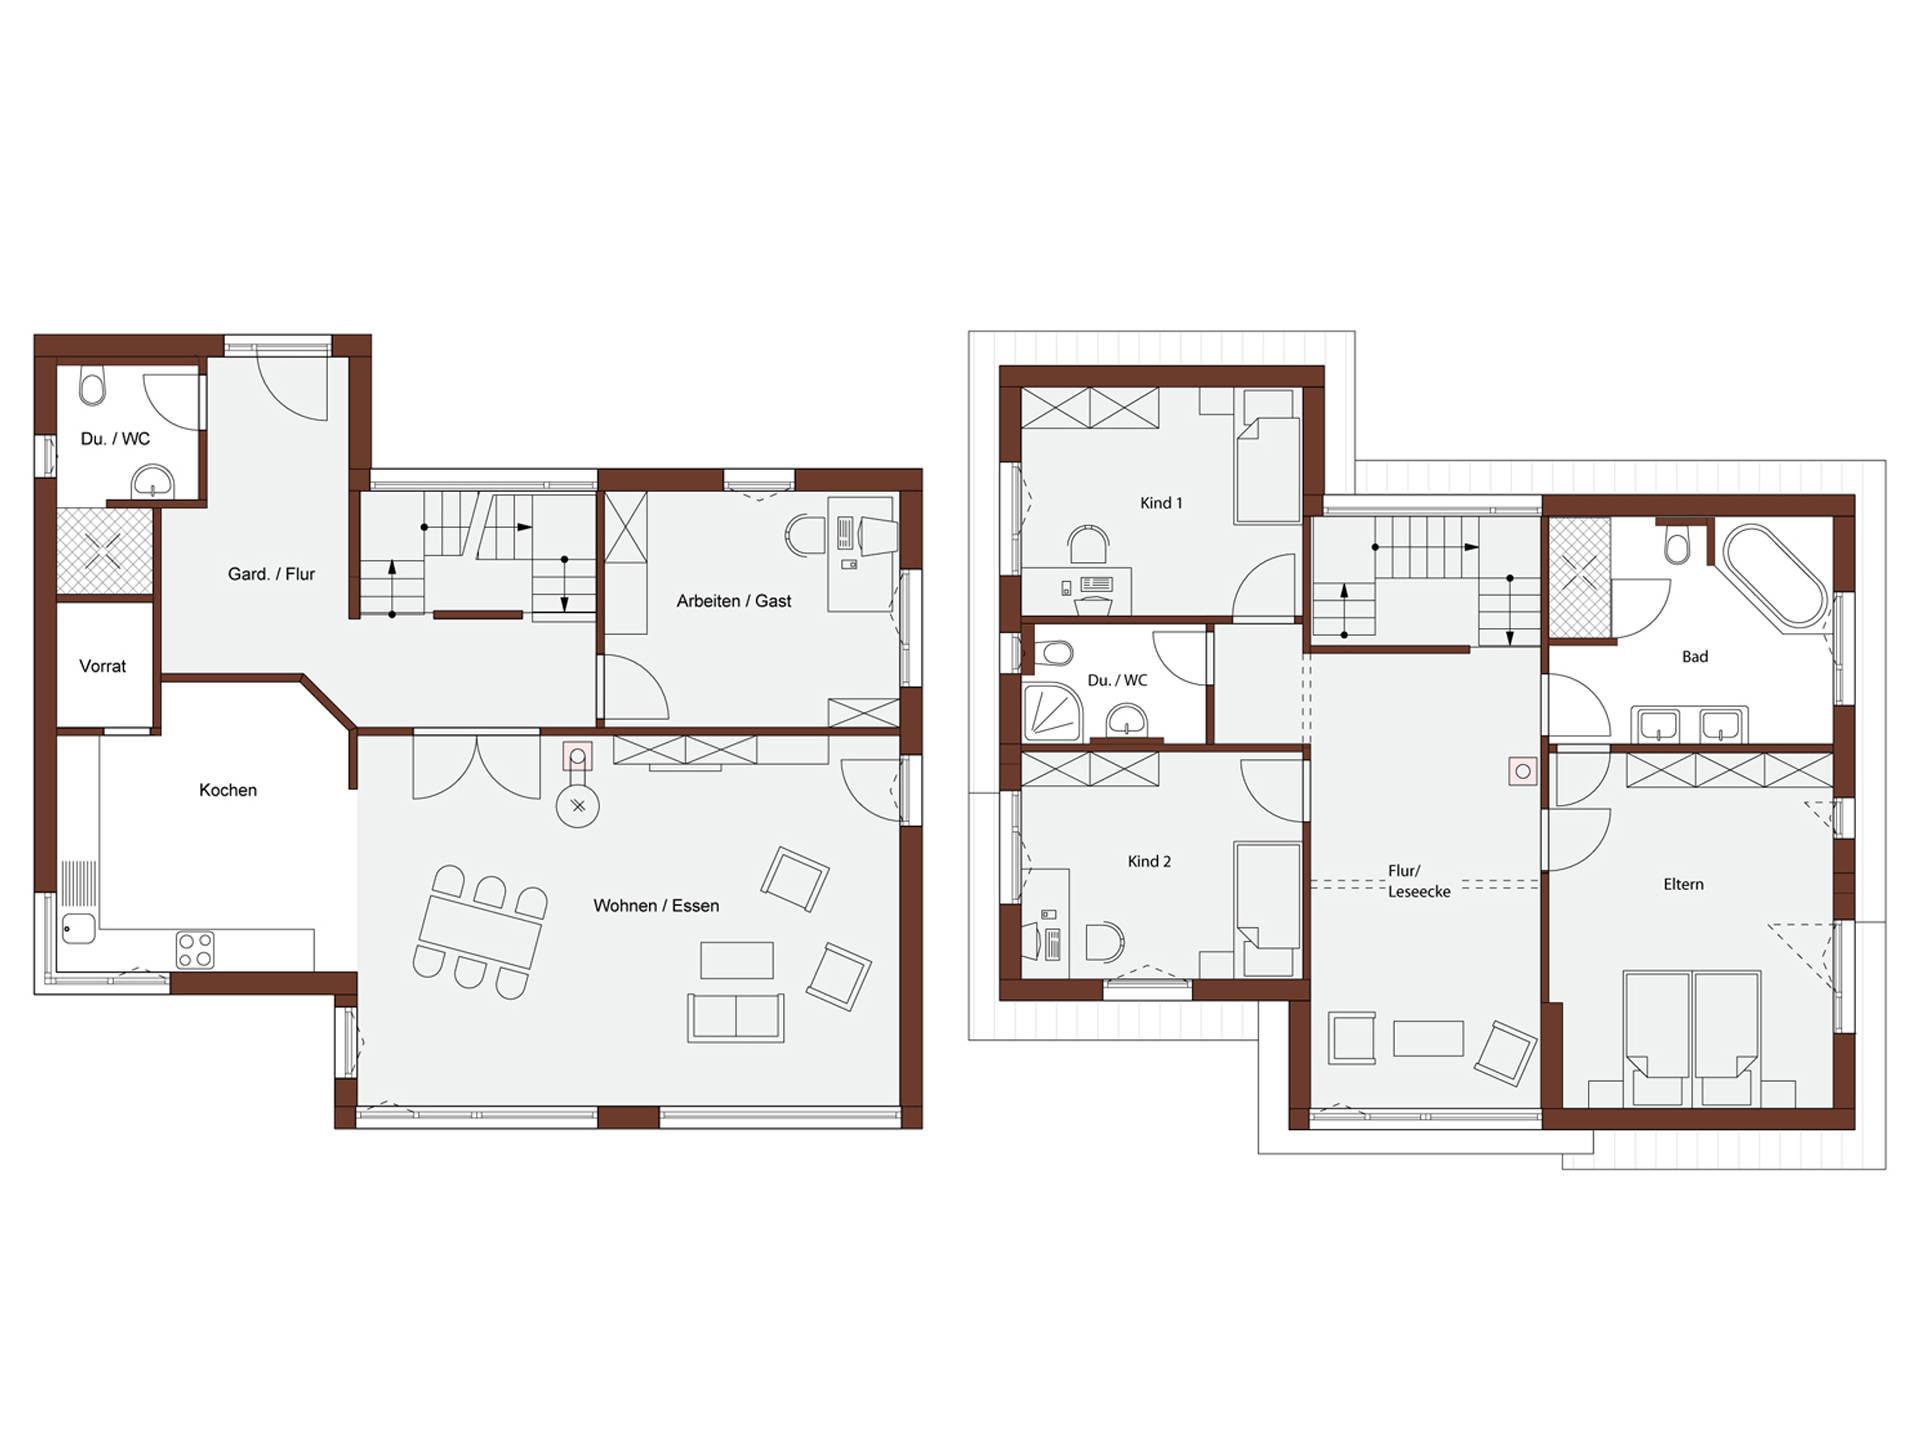 Haus design 182 frammelsberger r ingenieur holzhaus for Muster grundrisse haus